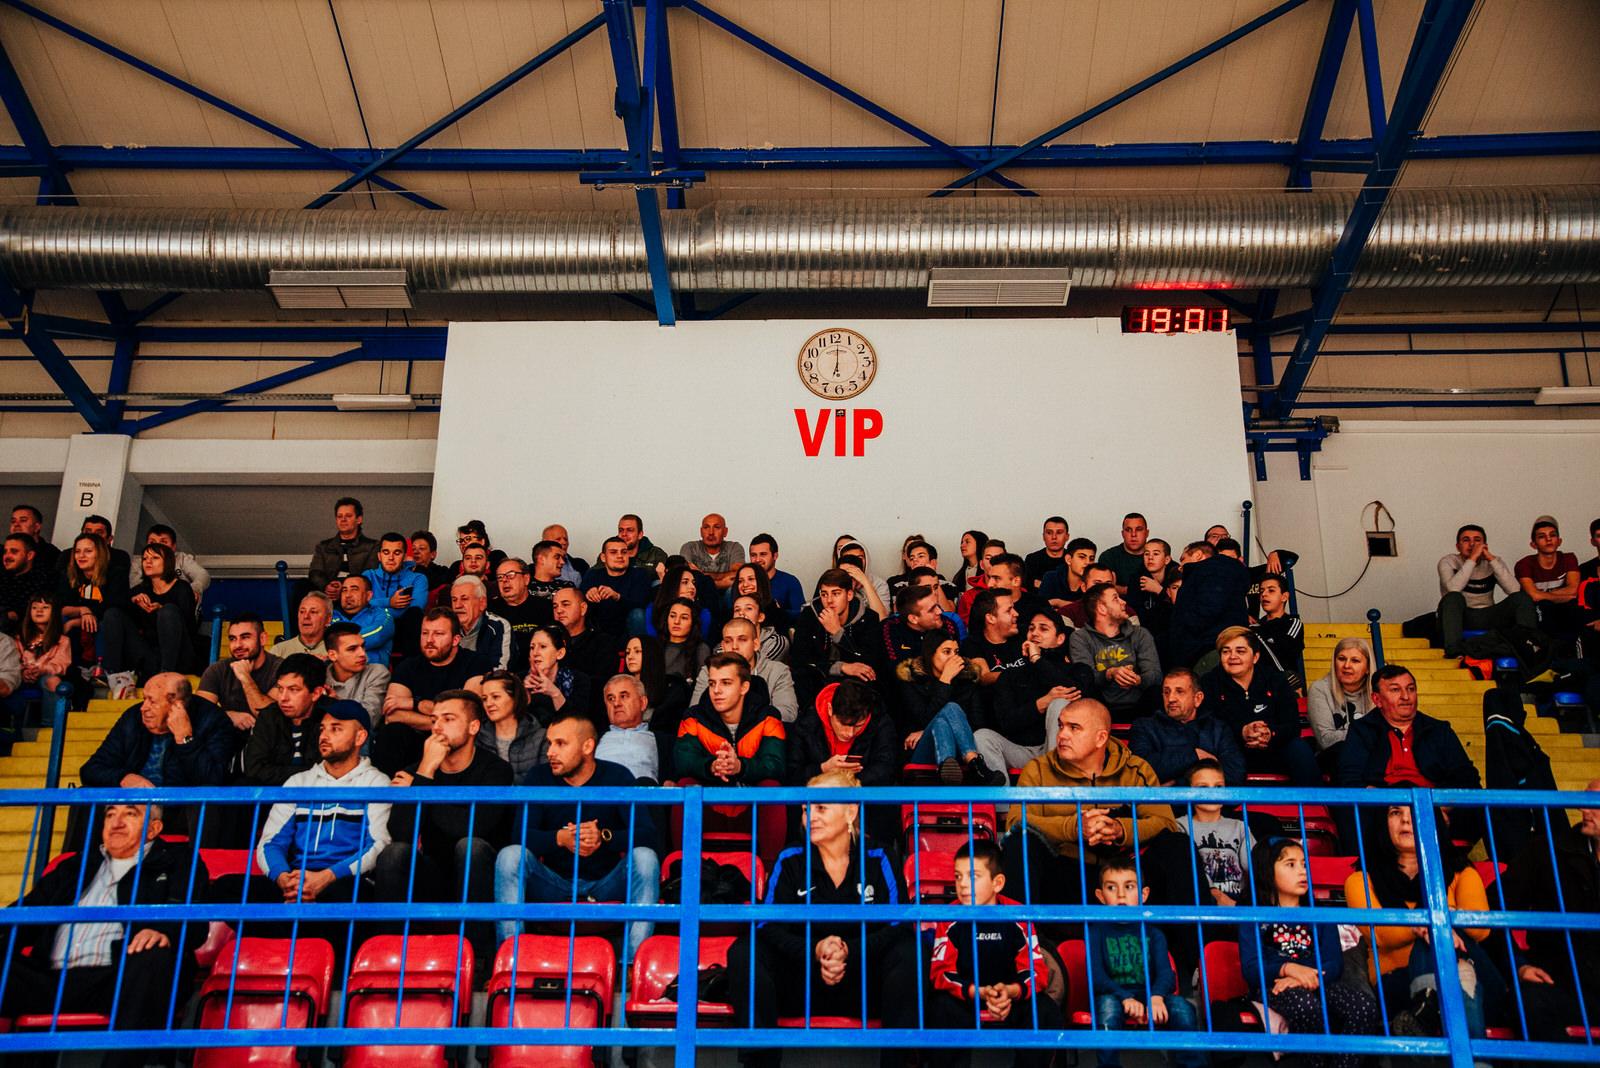 likaclub_zimska-malonogometna-liga-gospić_2019-20-28